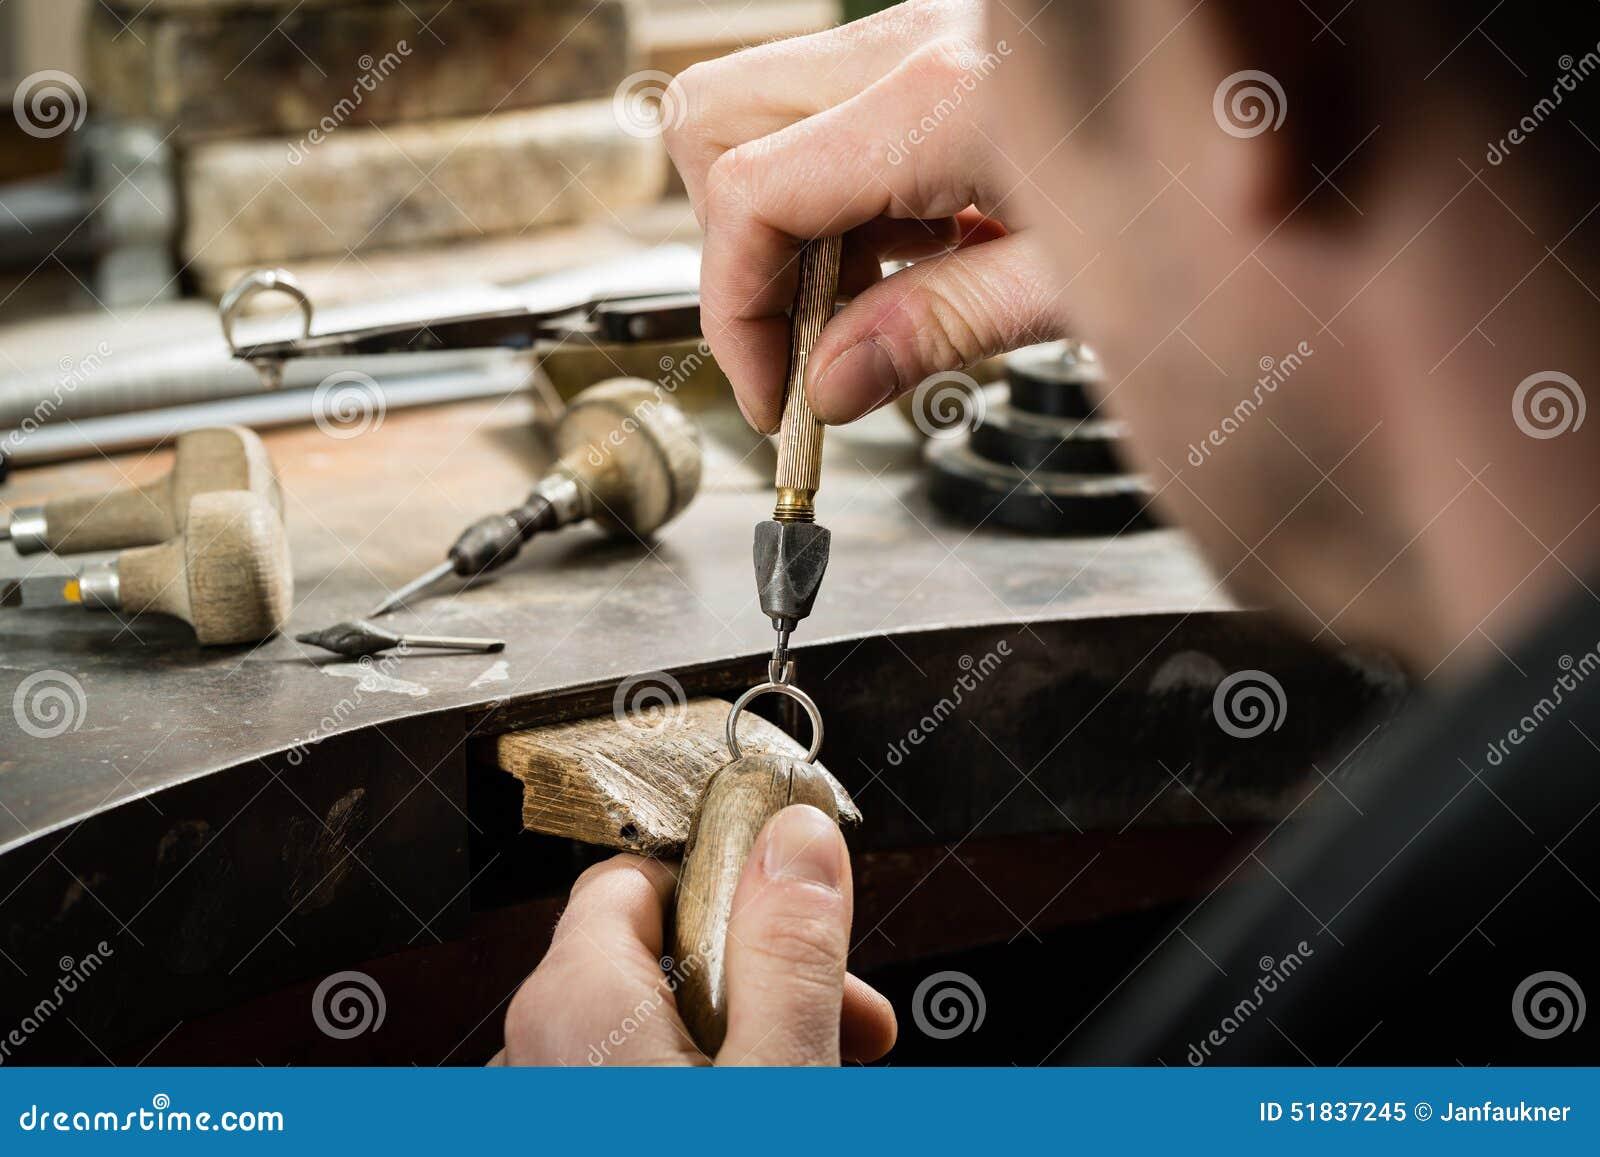 Craft jewellery making.